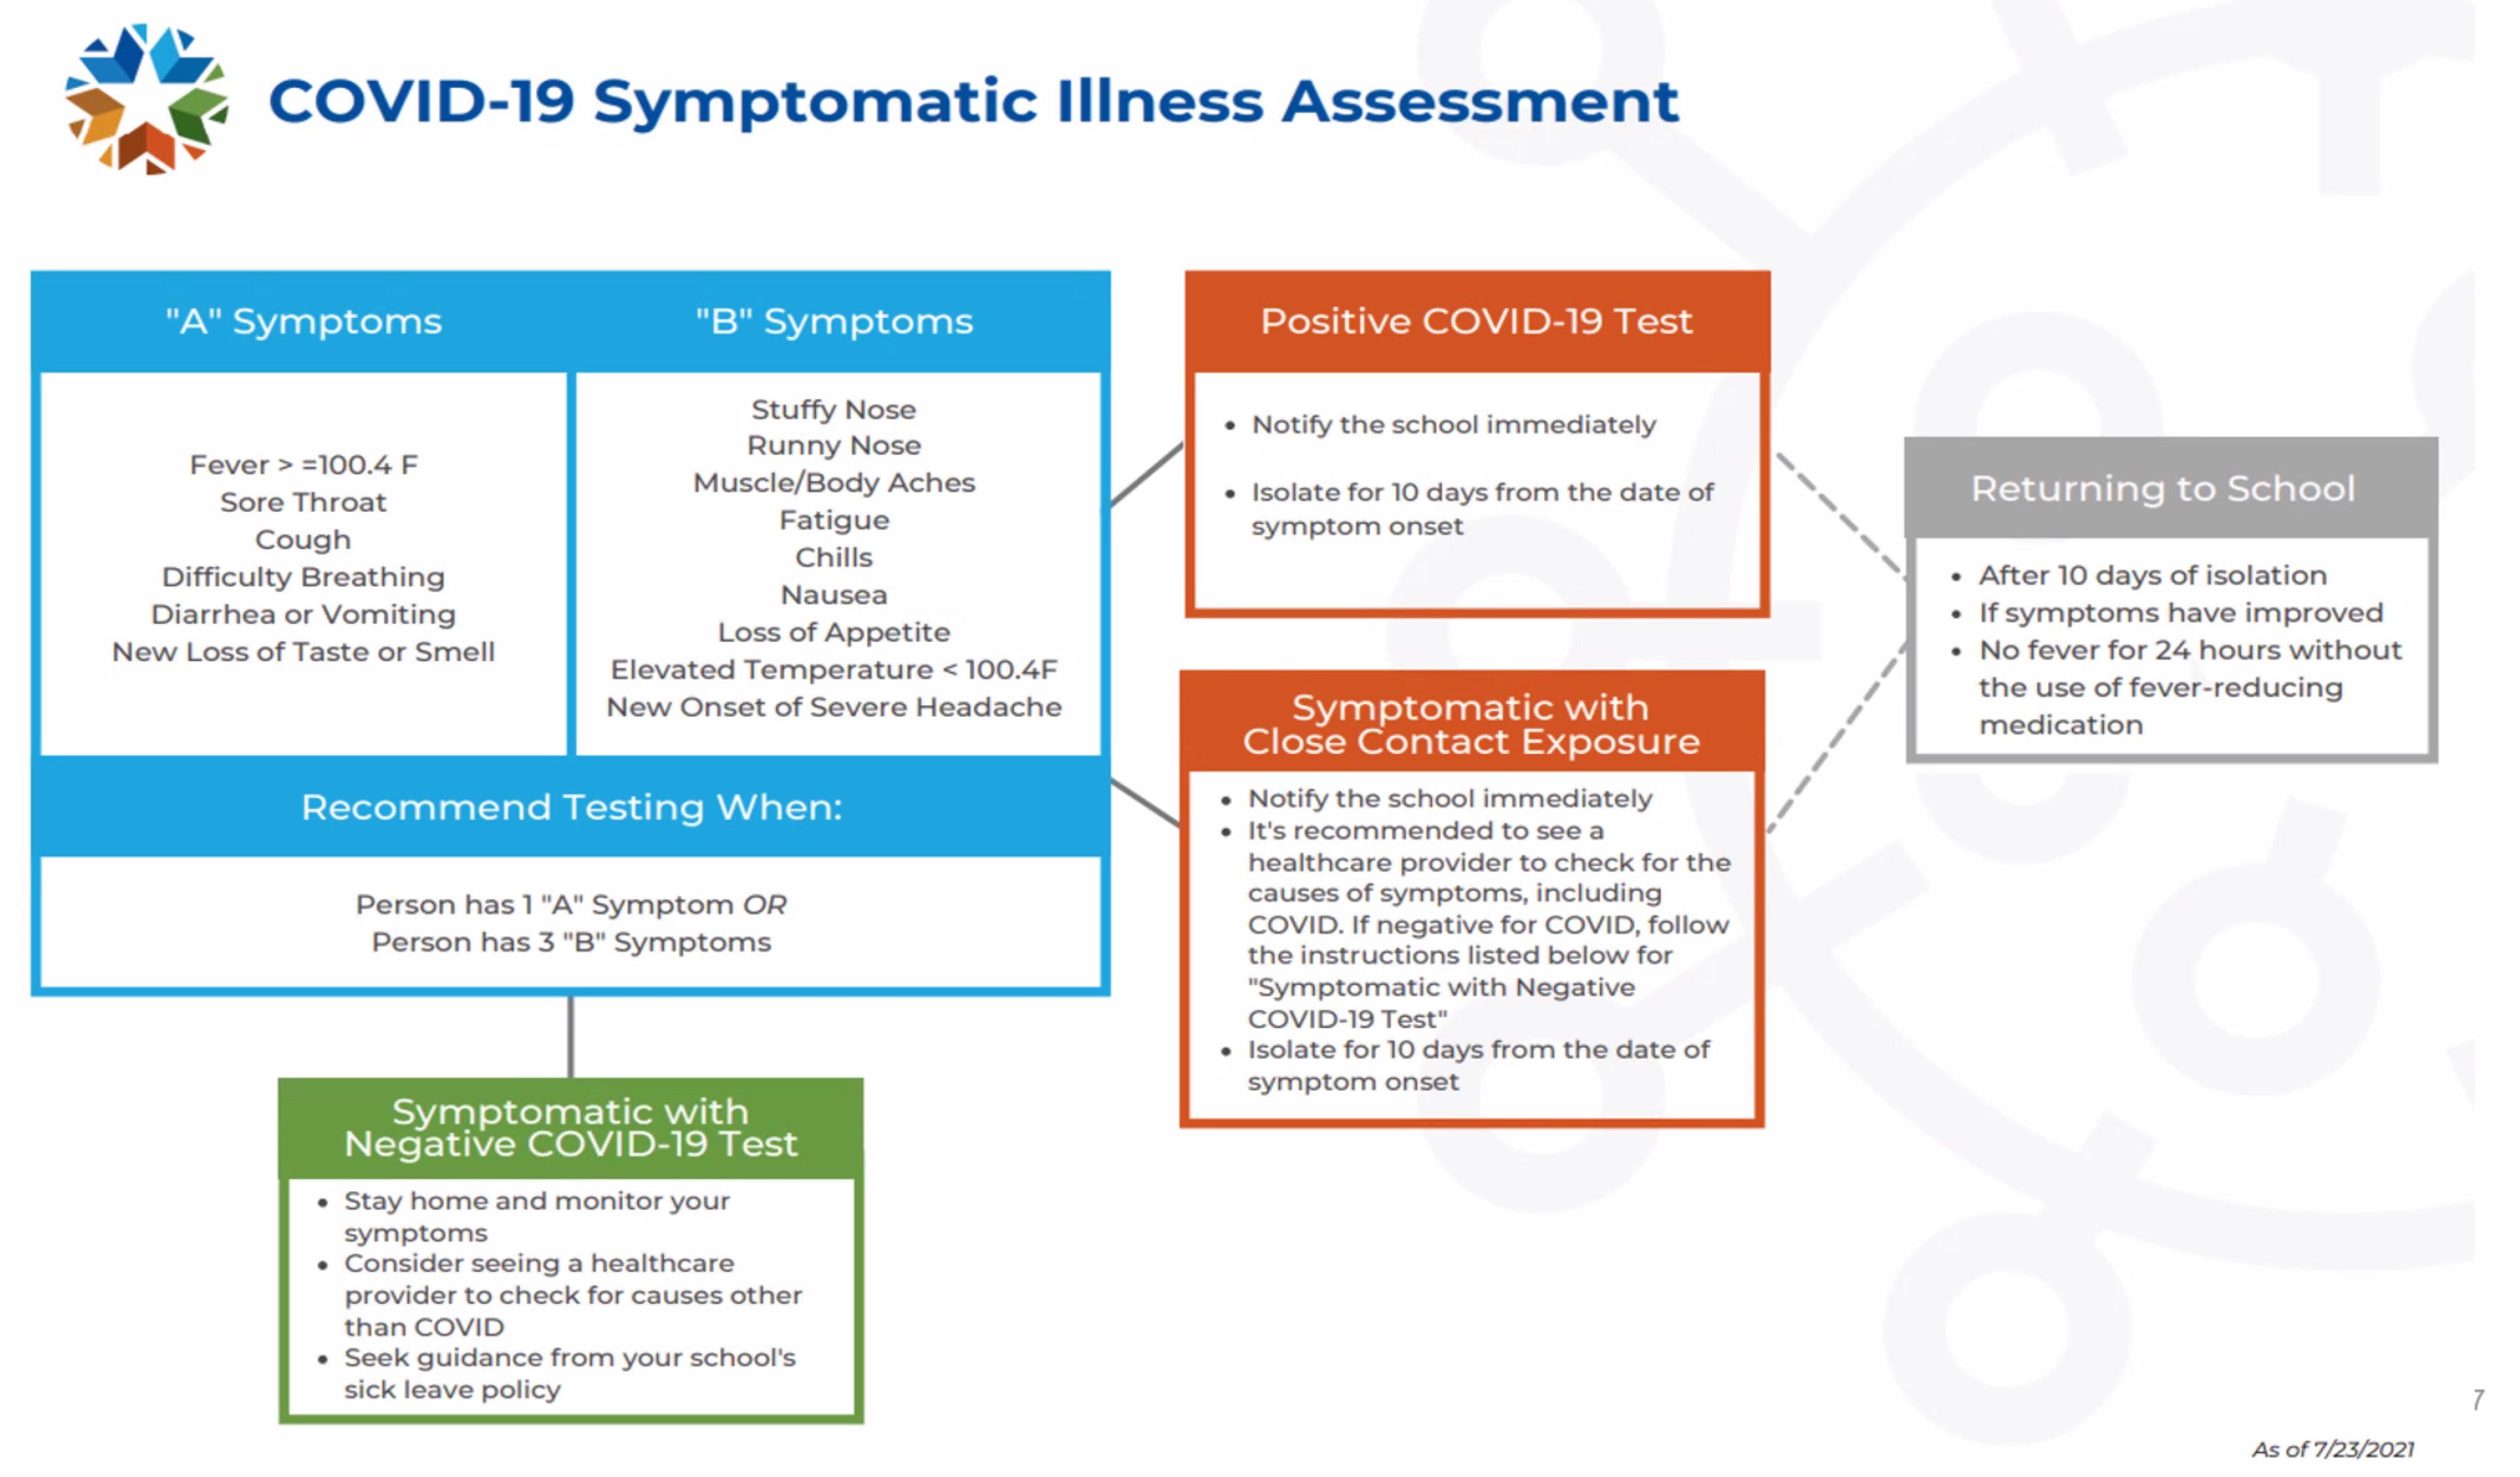 Symptomatic Illness Assessment